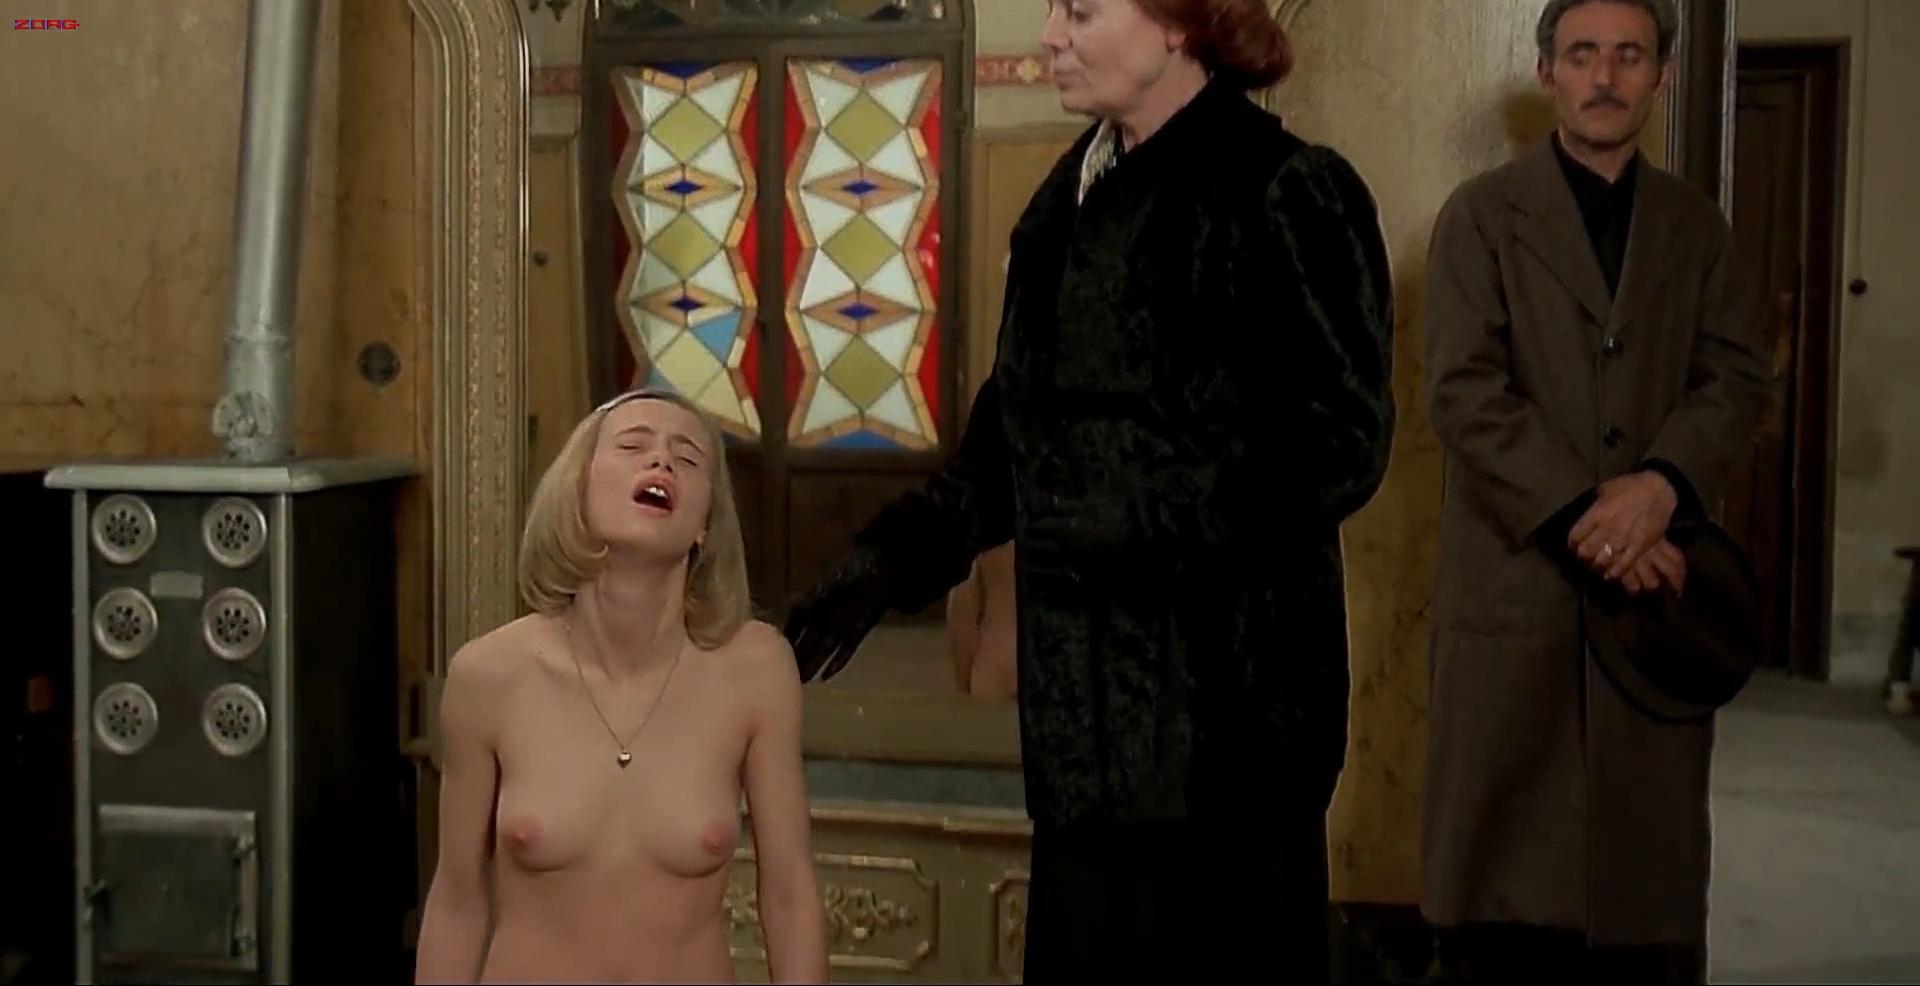 Renata Moar nude full frontal - Salo - 120 Days of Sodom (1975) hd1080p (2)